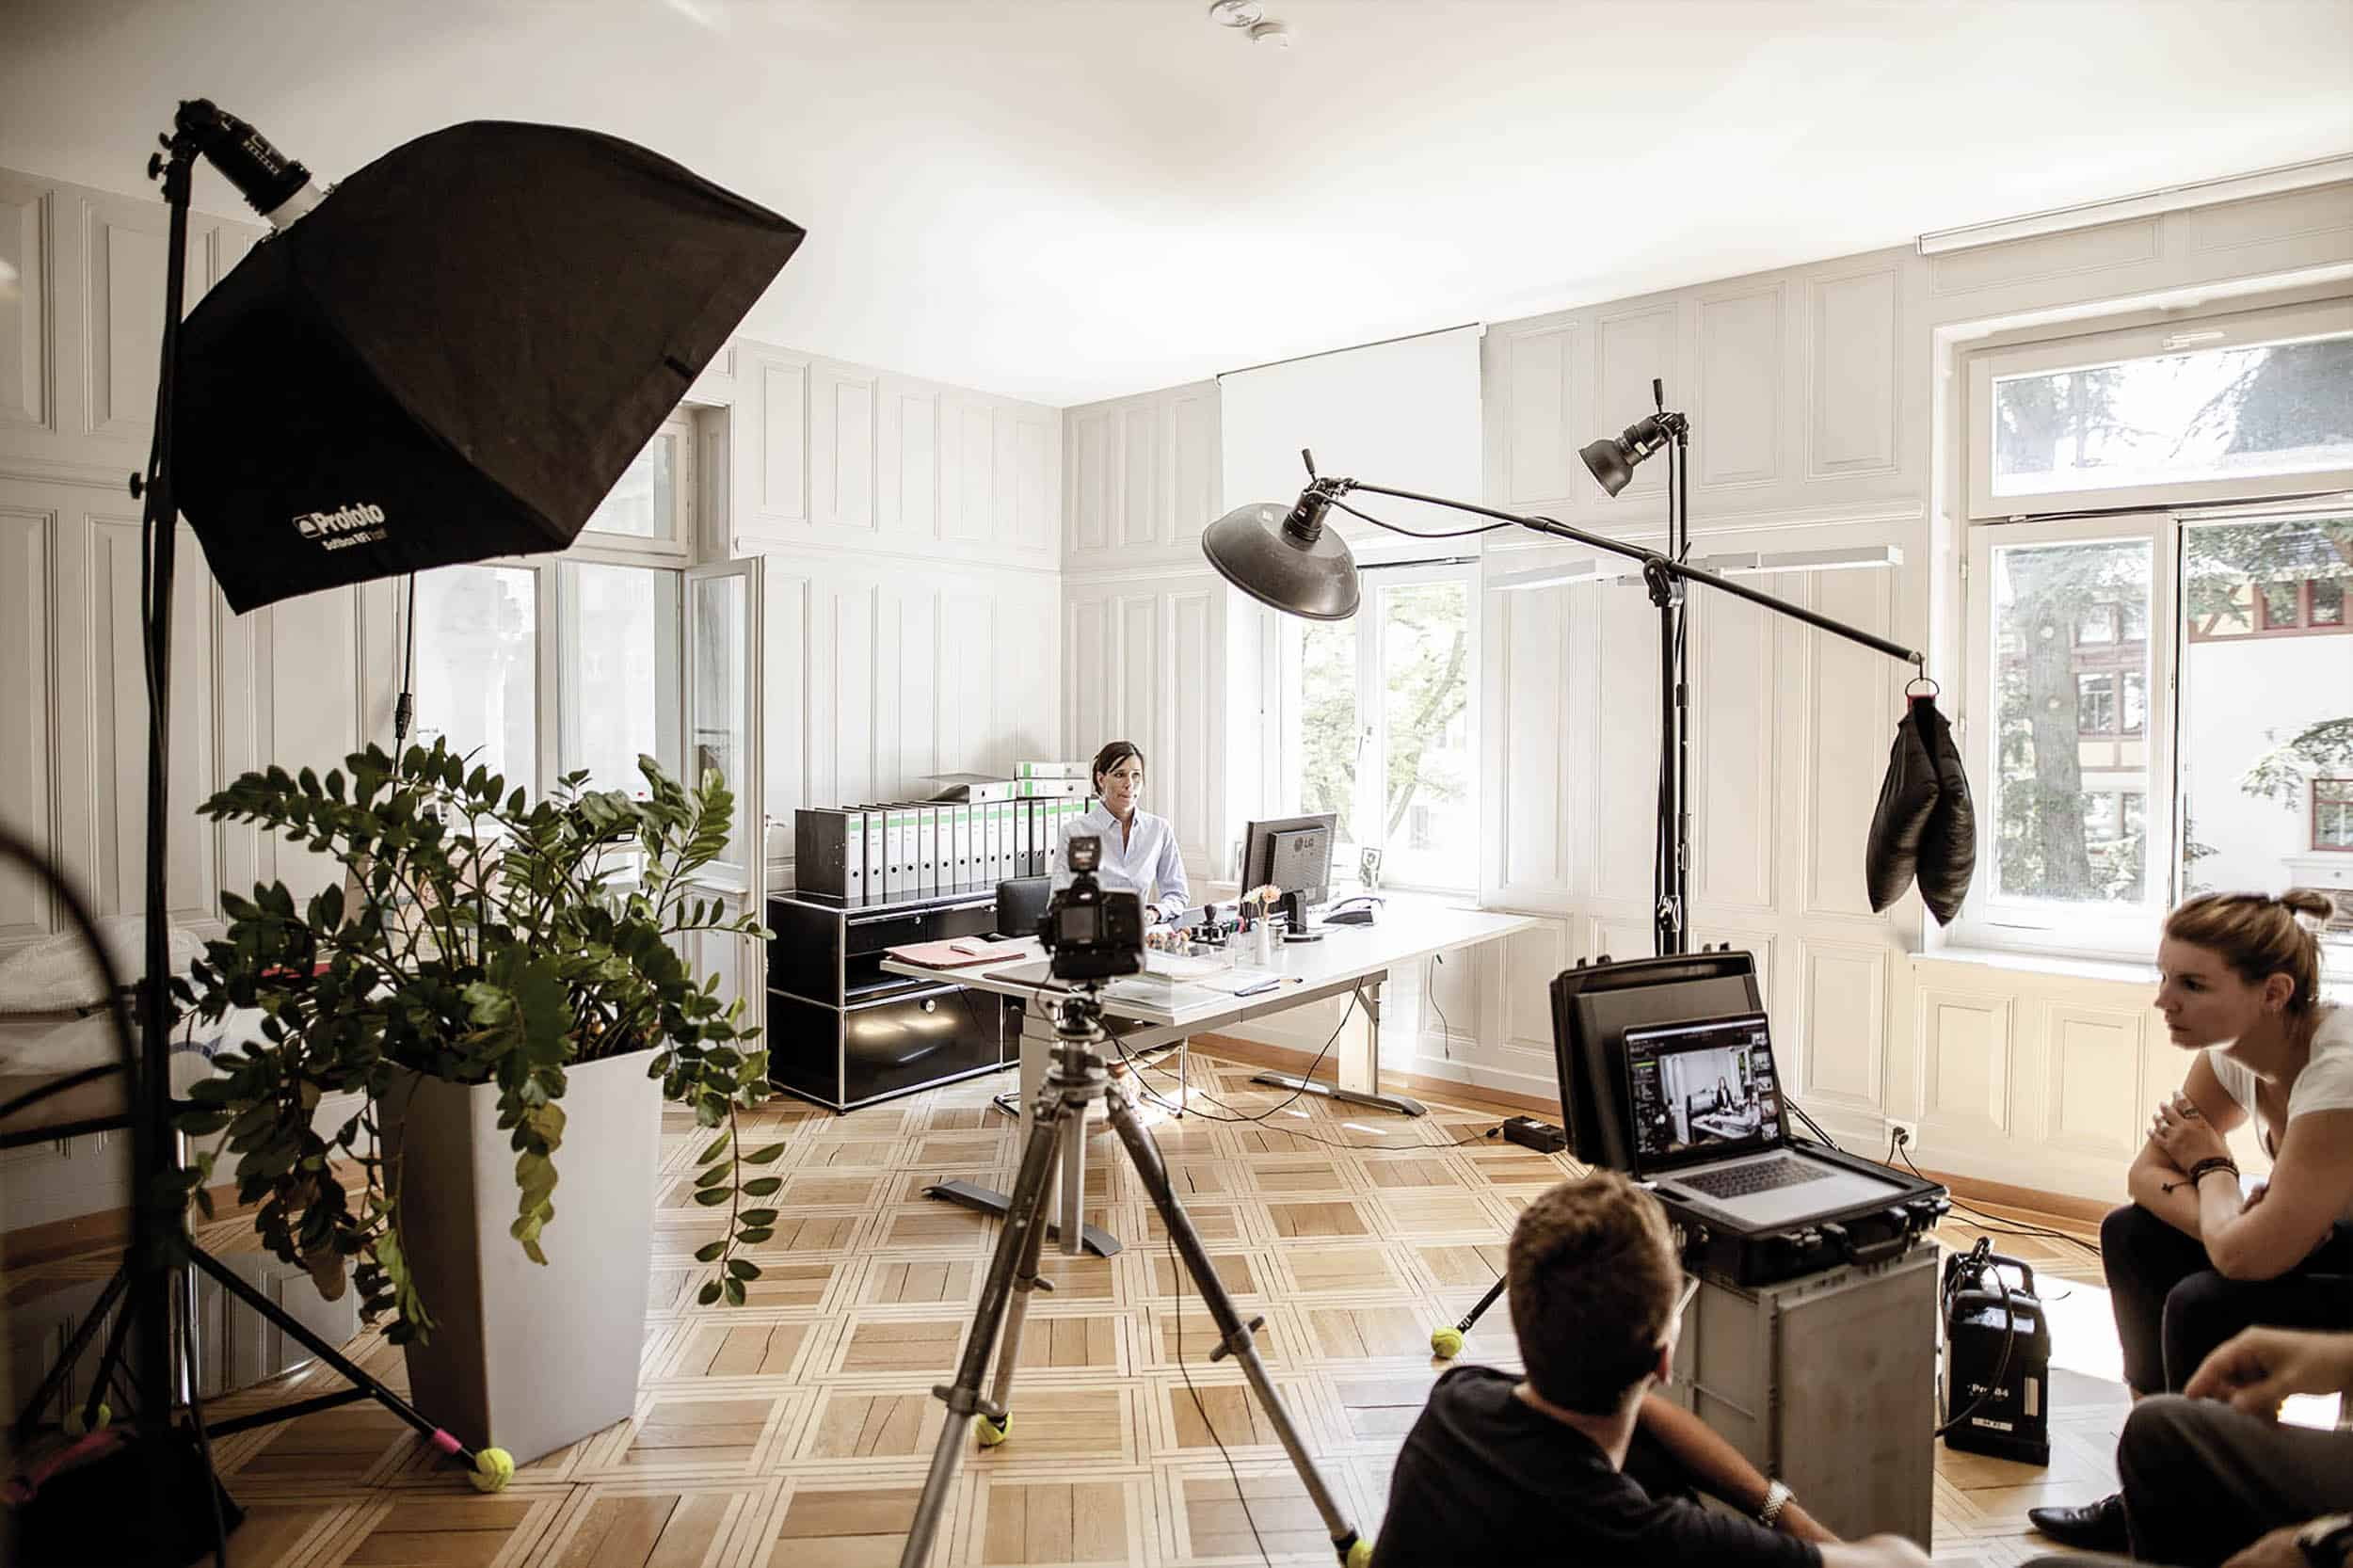 studio-ignatov-sbb-b2b-travel-main-ch-imagekampagne-makingof-13